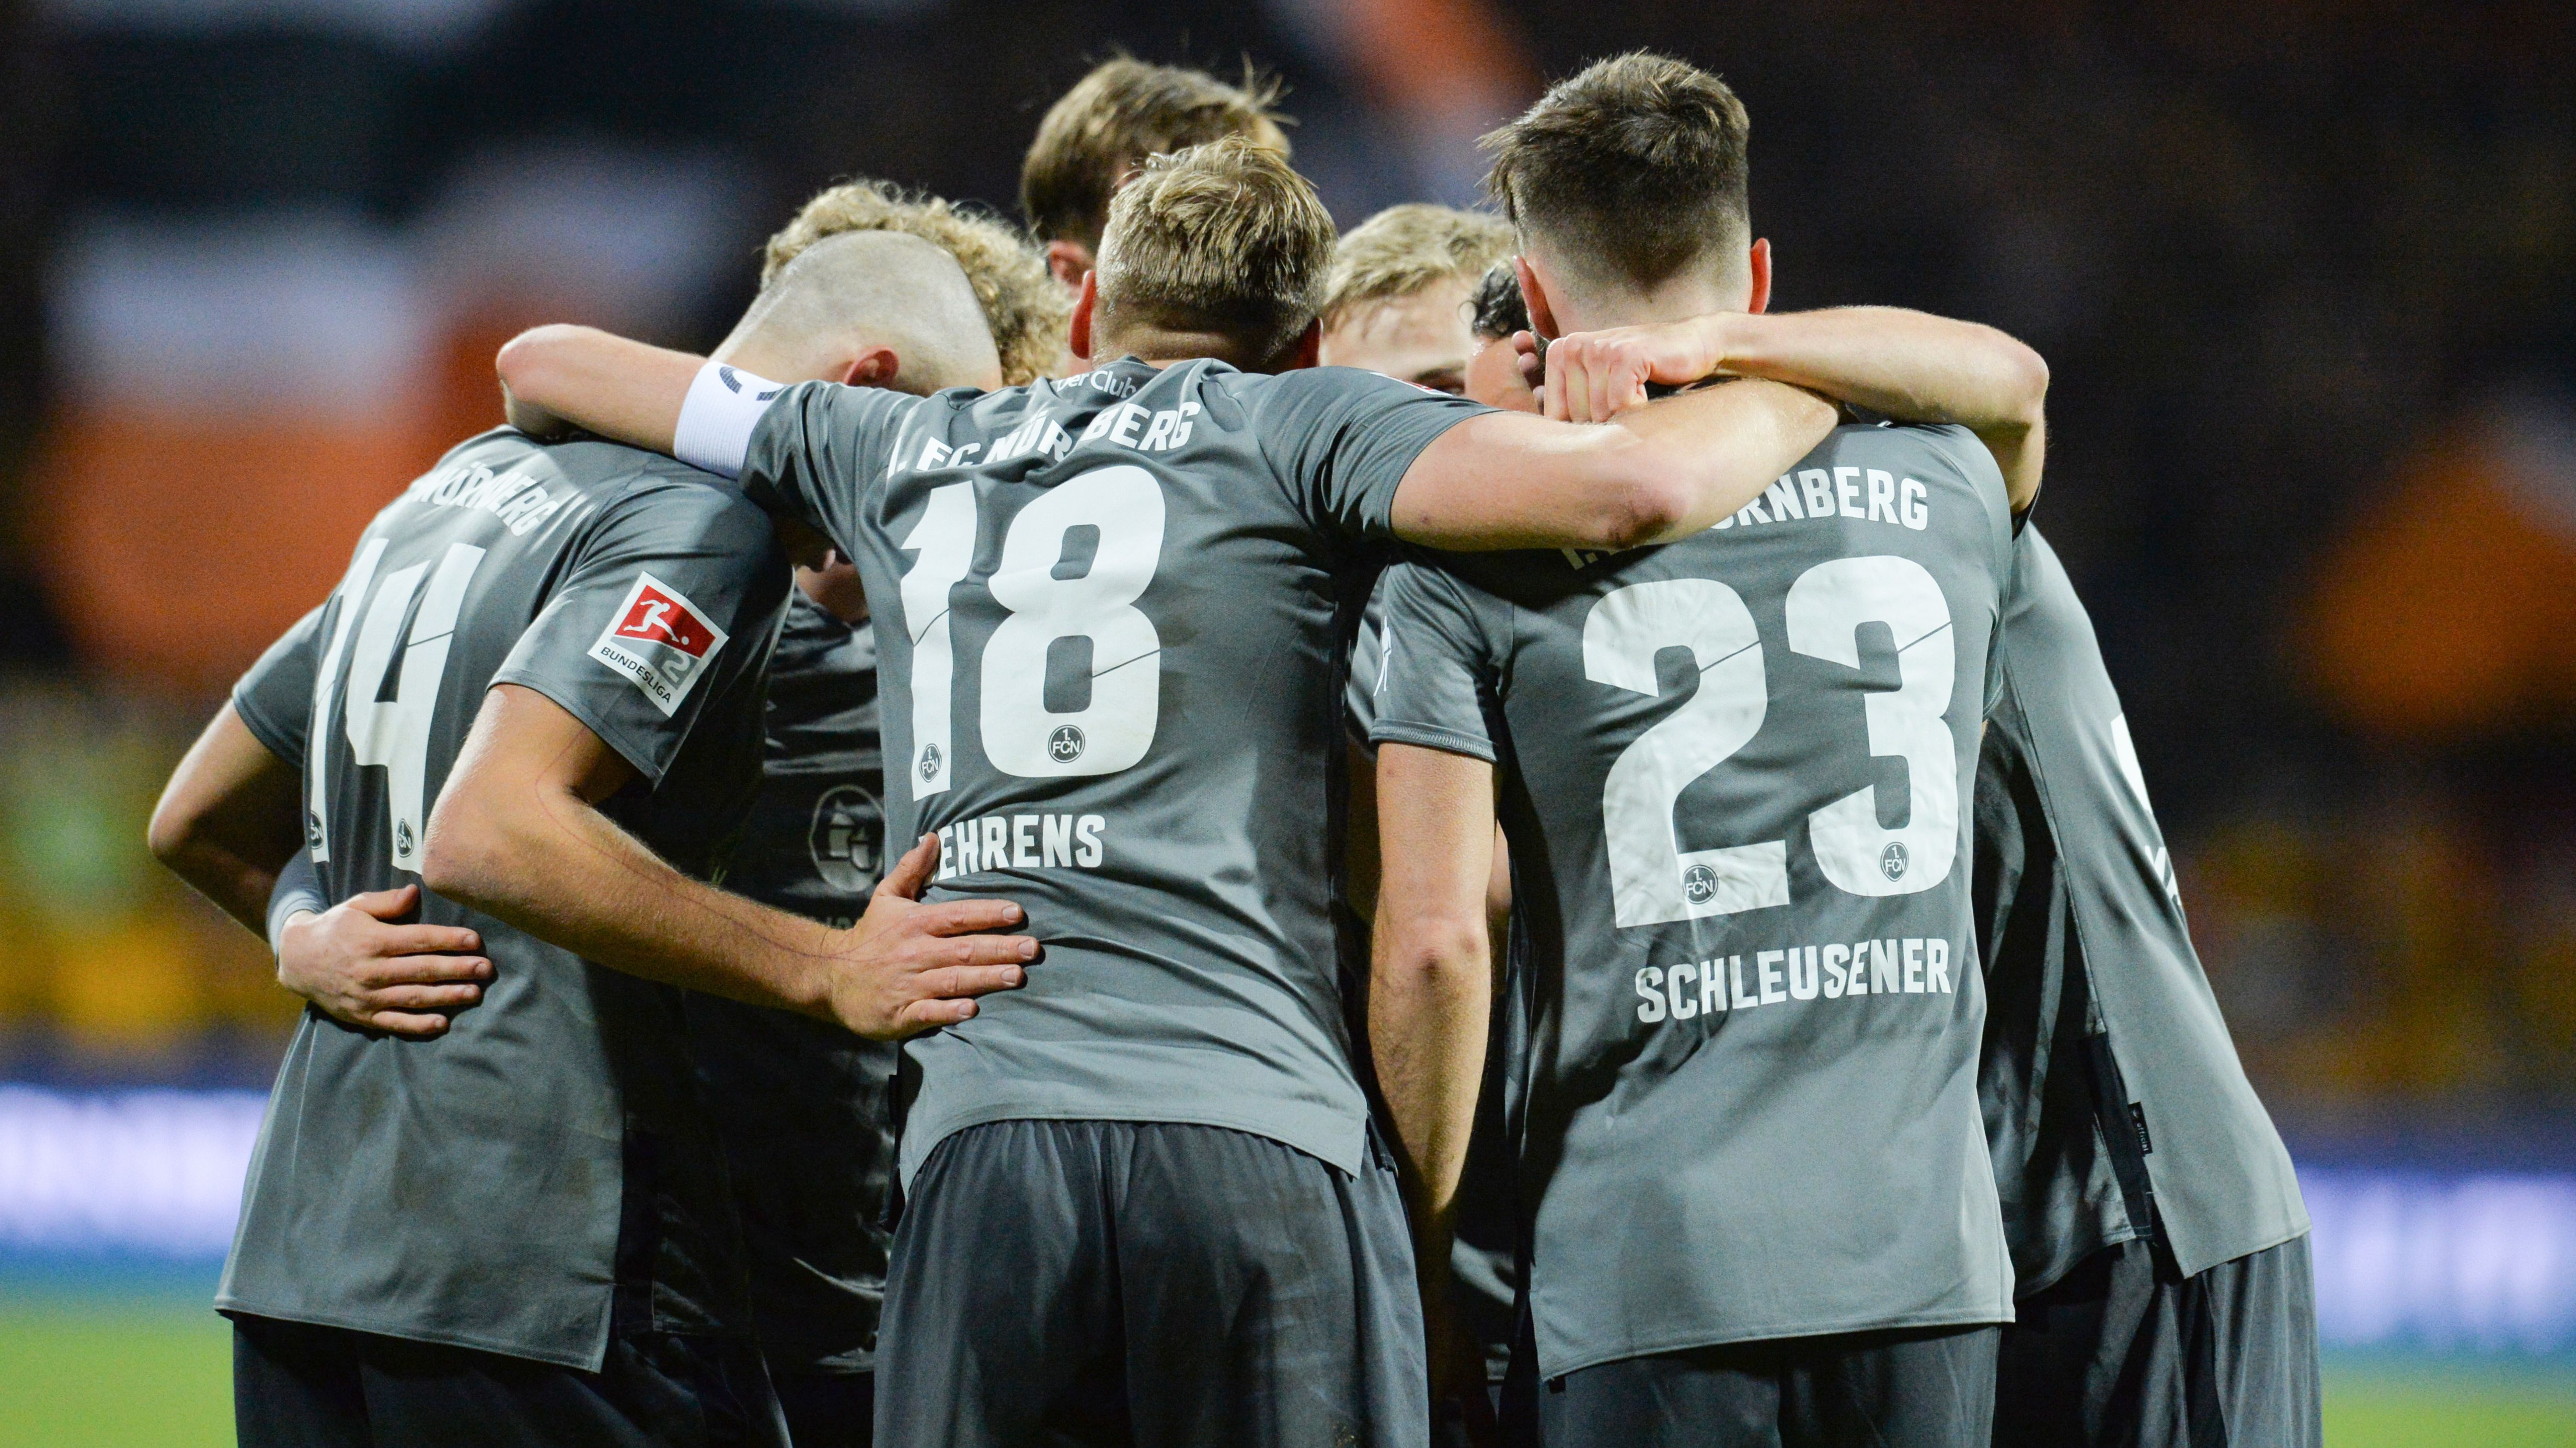 Die Mannschaft des 1. FC Nürnberg